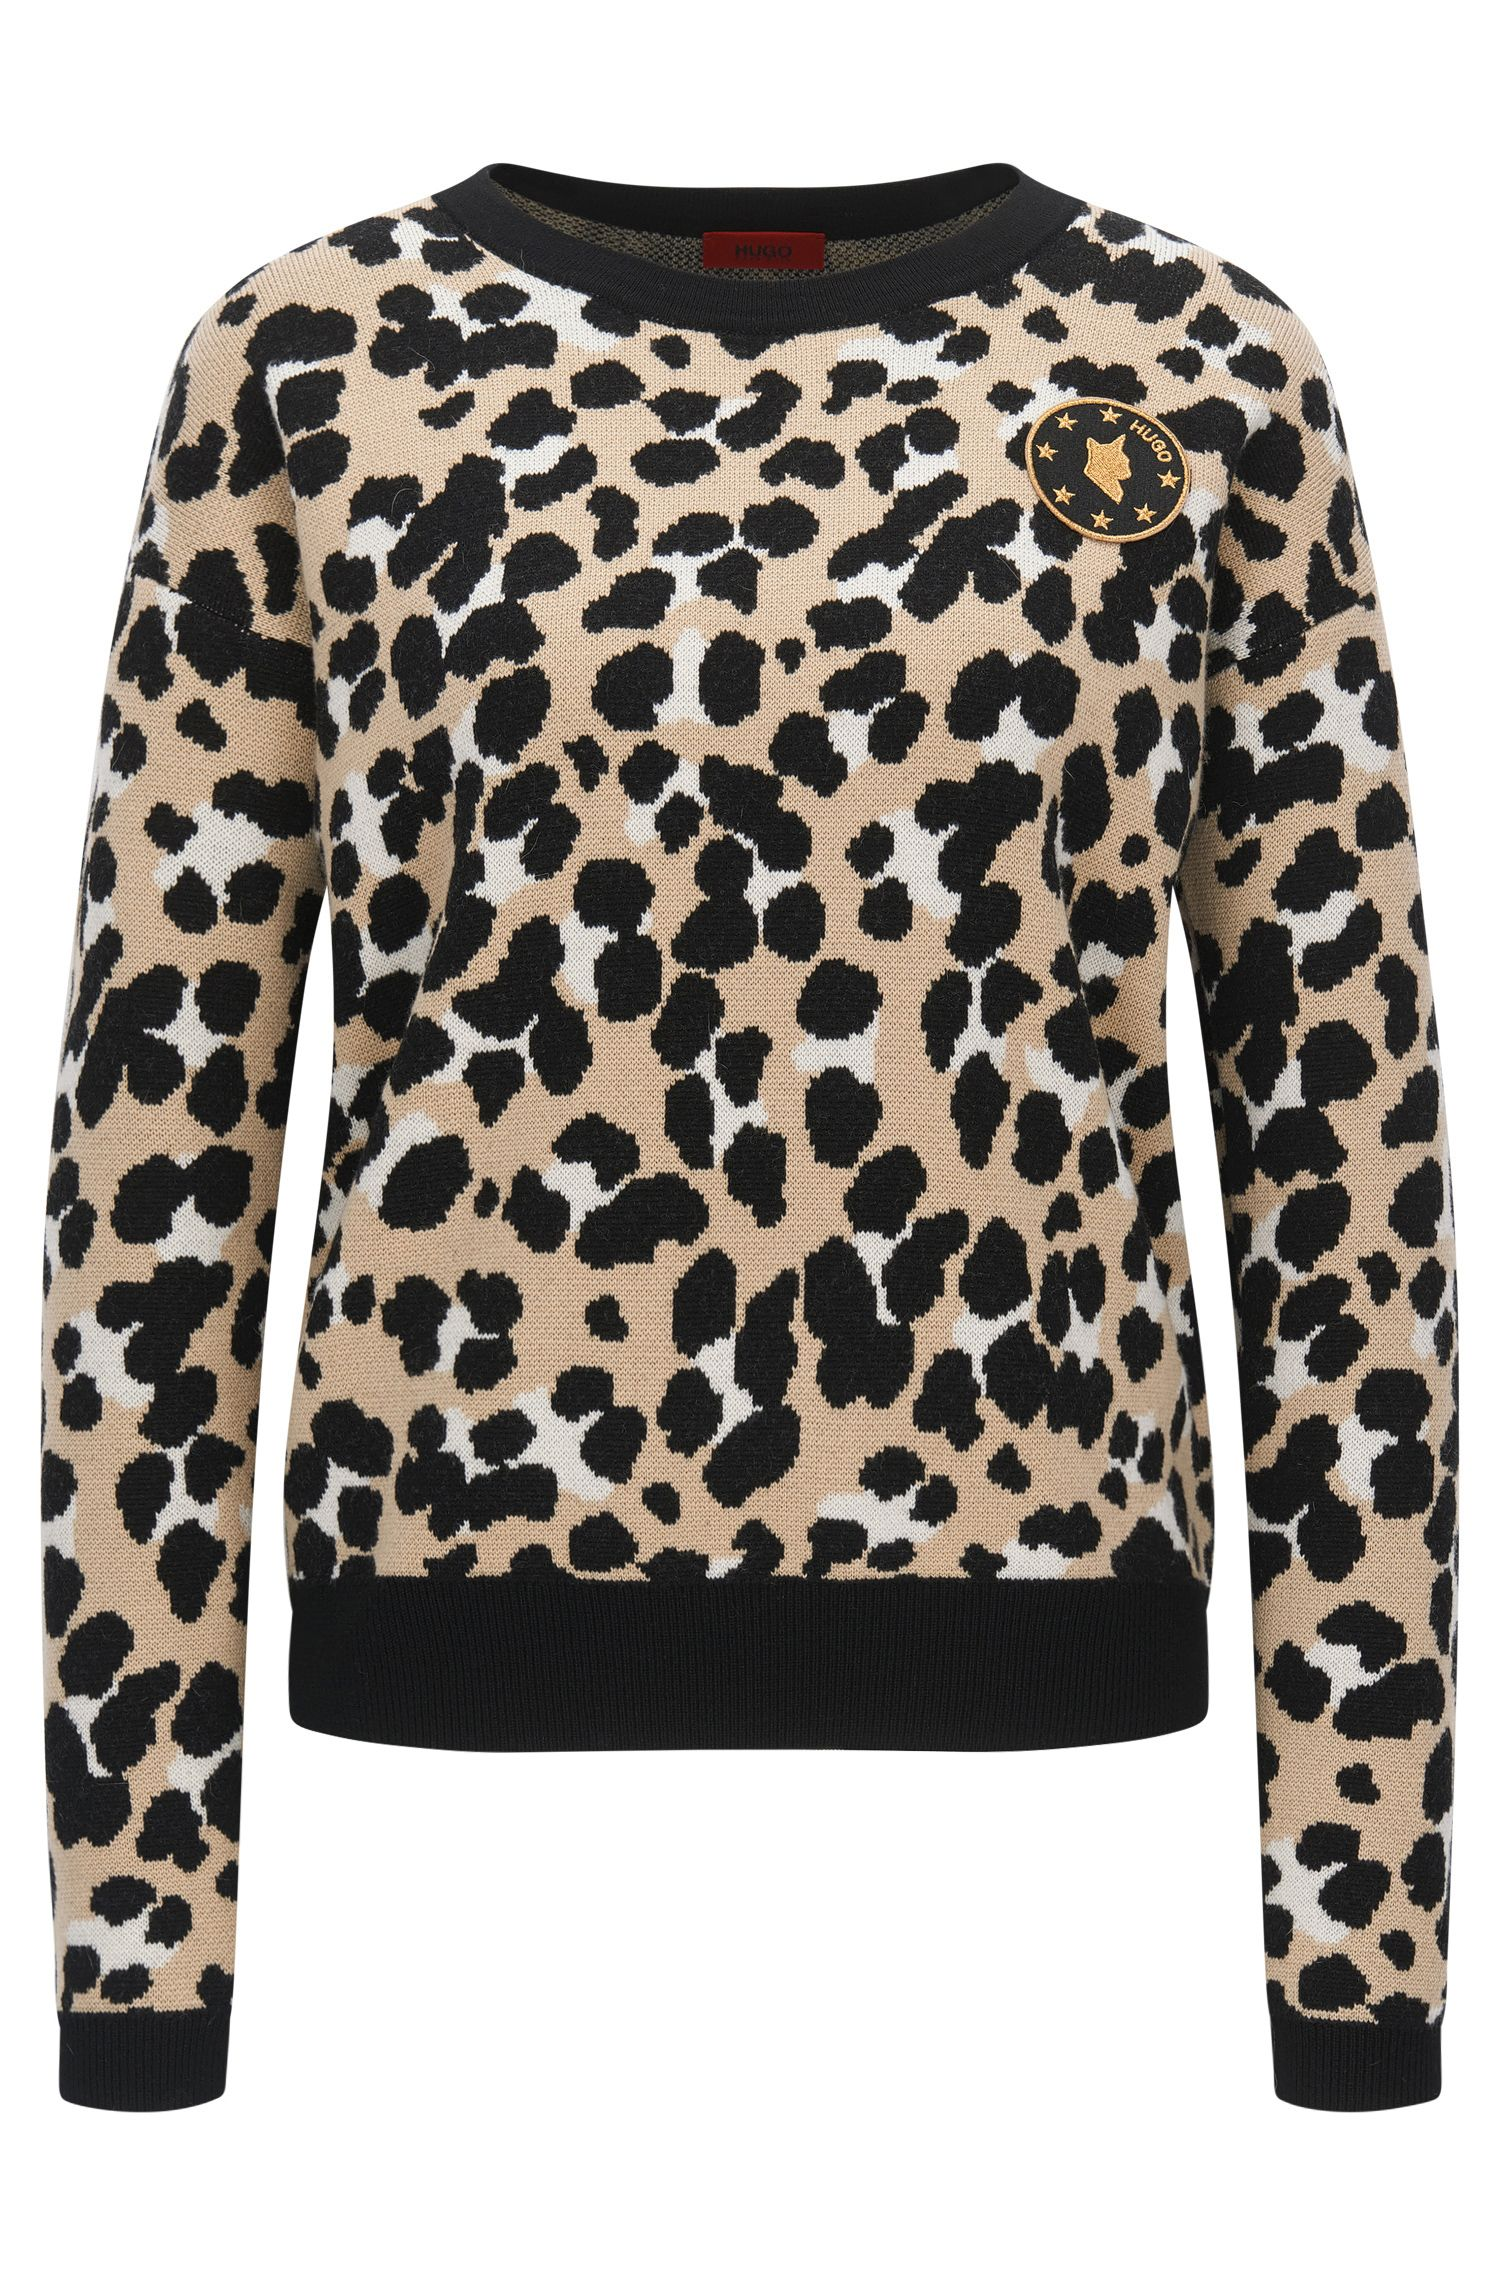 Cheetah-pattern sweater in virgin wool